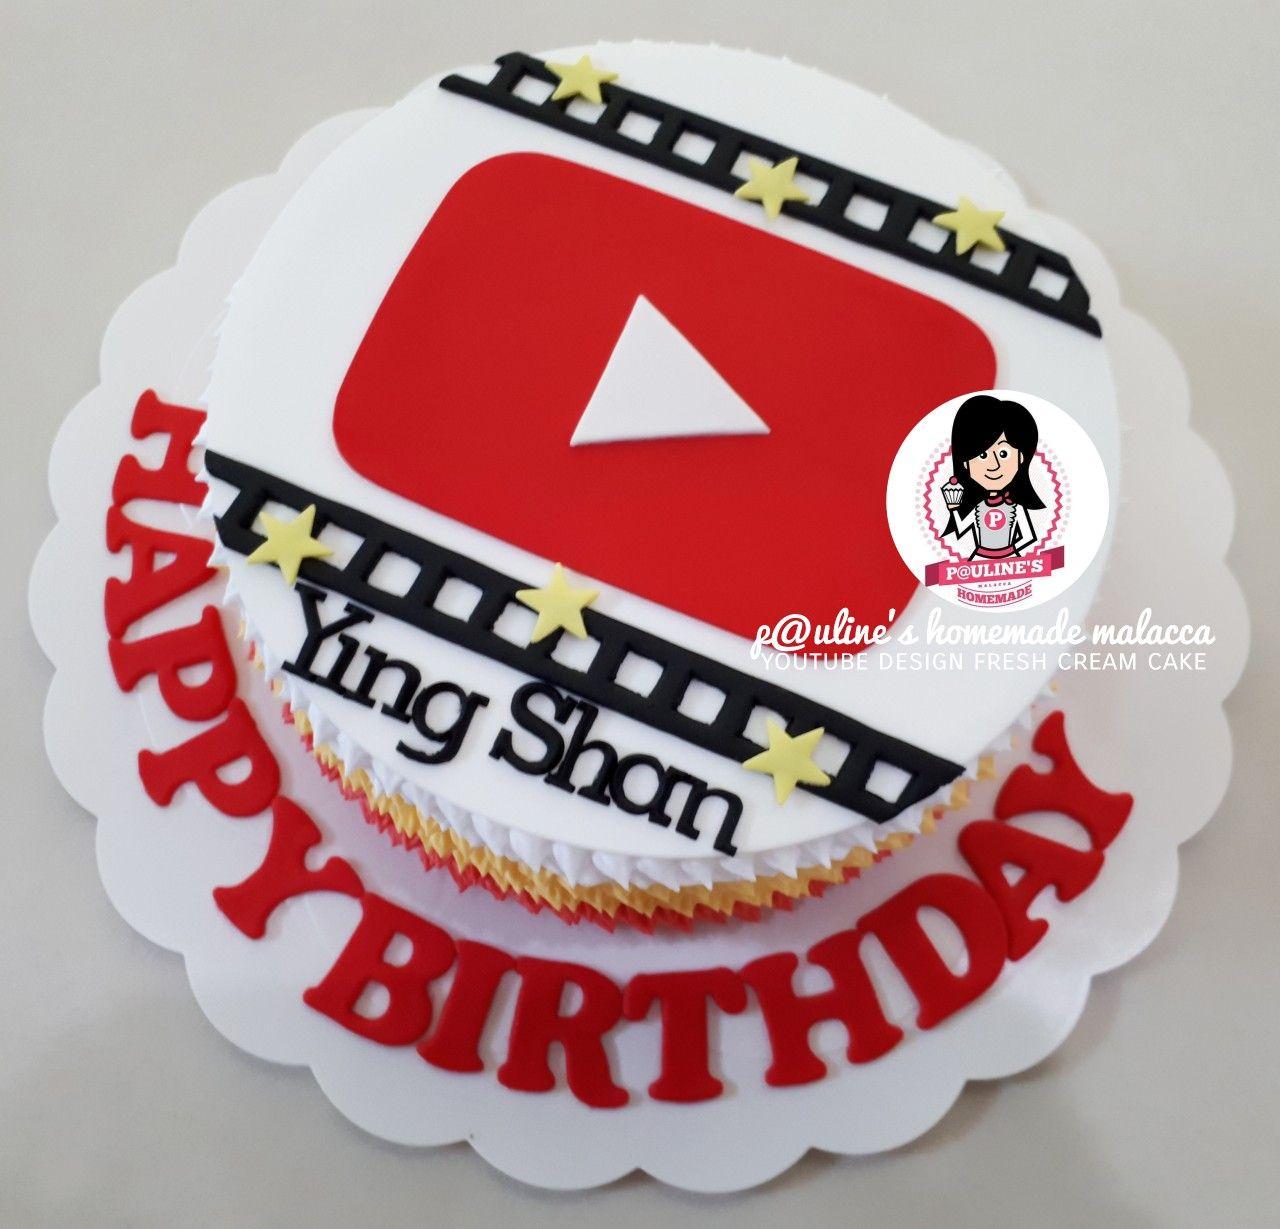 Youtube Design Fresh Cream Cake Paulineshomemademalacca Cake Designs For Kids Fresh Cream Cake